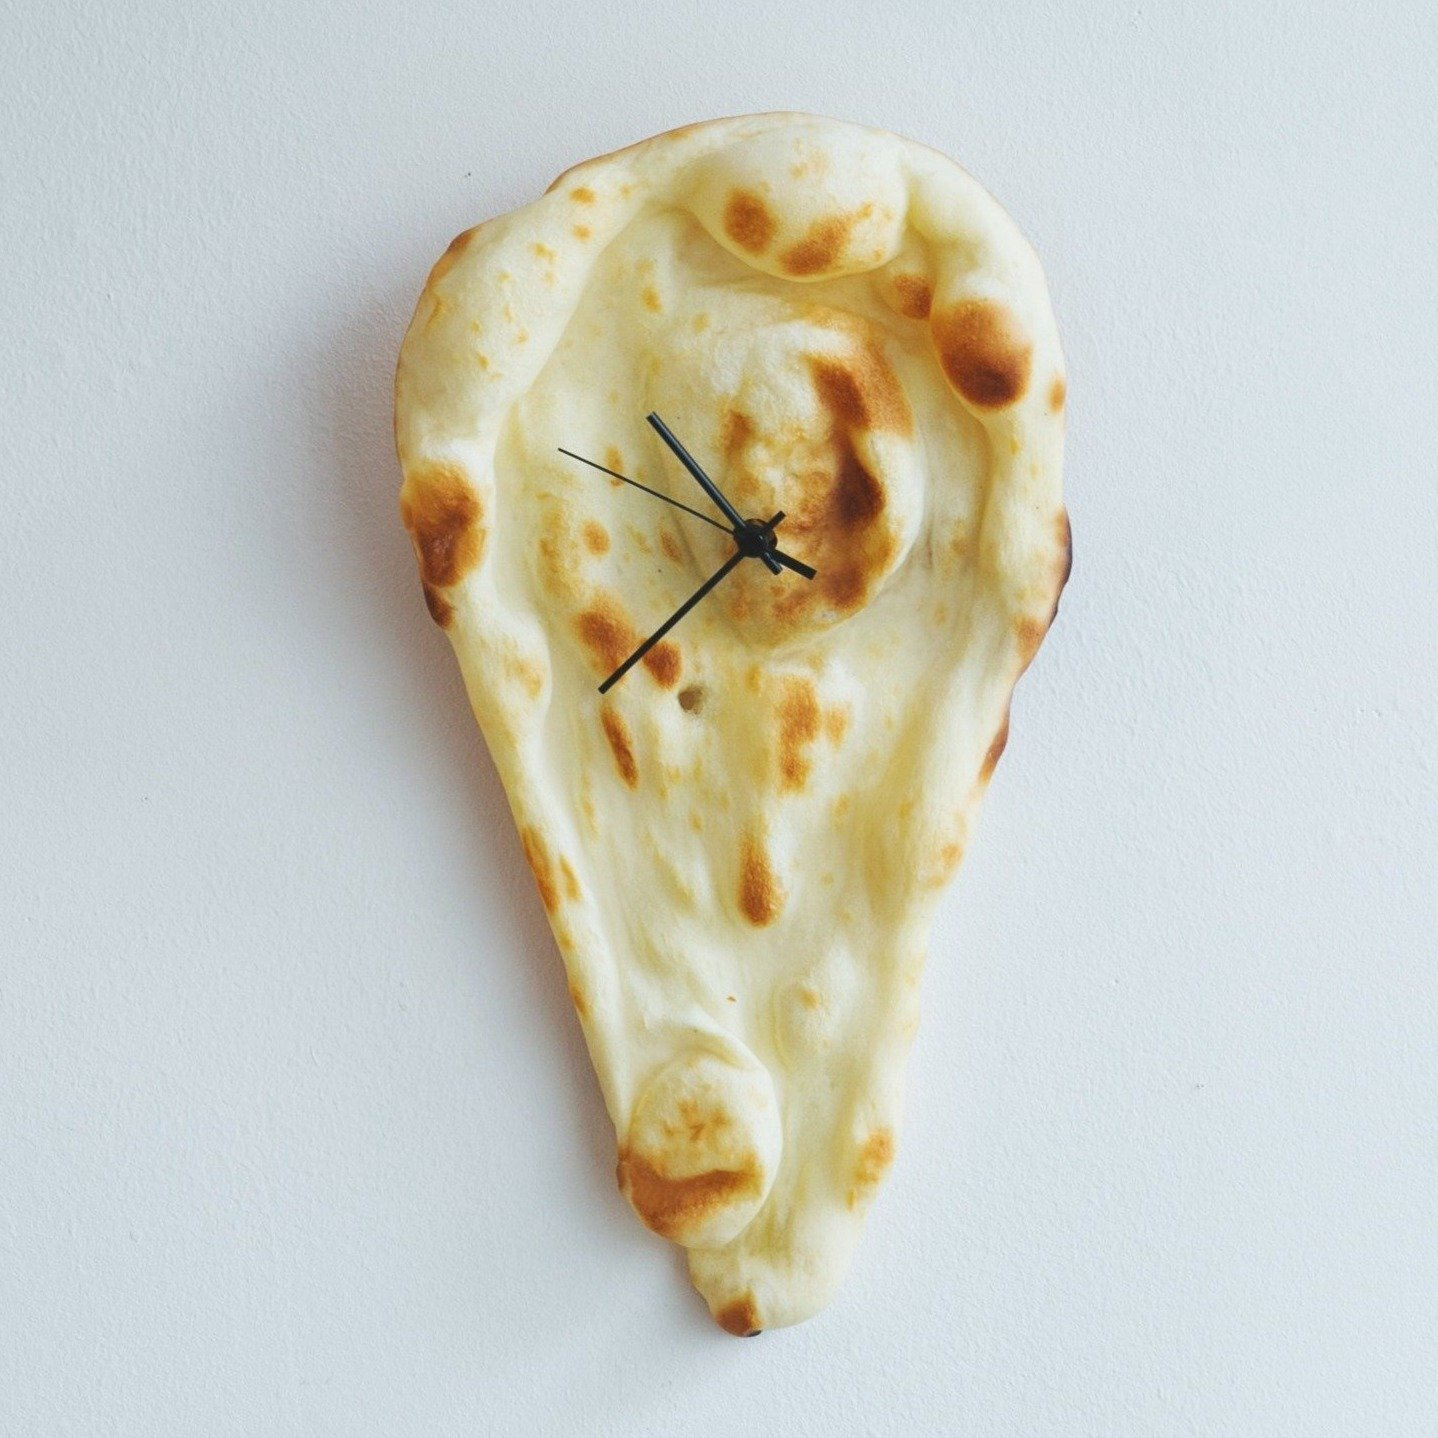 PAMPSHADE(パンプシェード)   NAAAAN time?「今、ナン時」  (時計・壁掛け時計・電池タイプ)